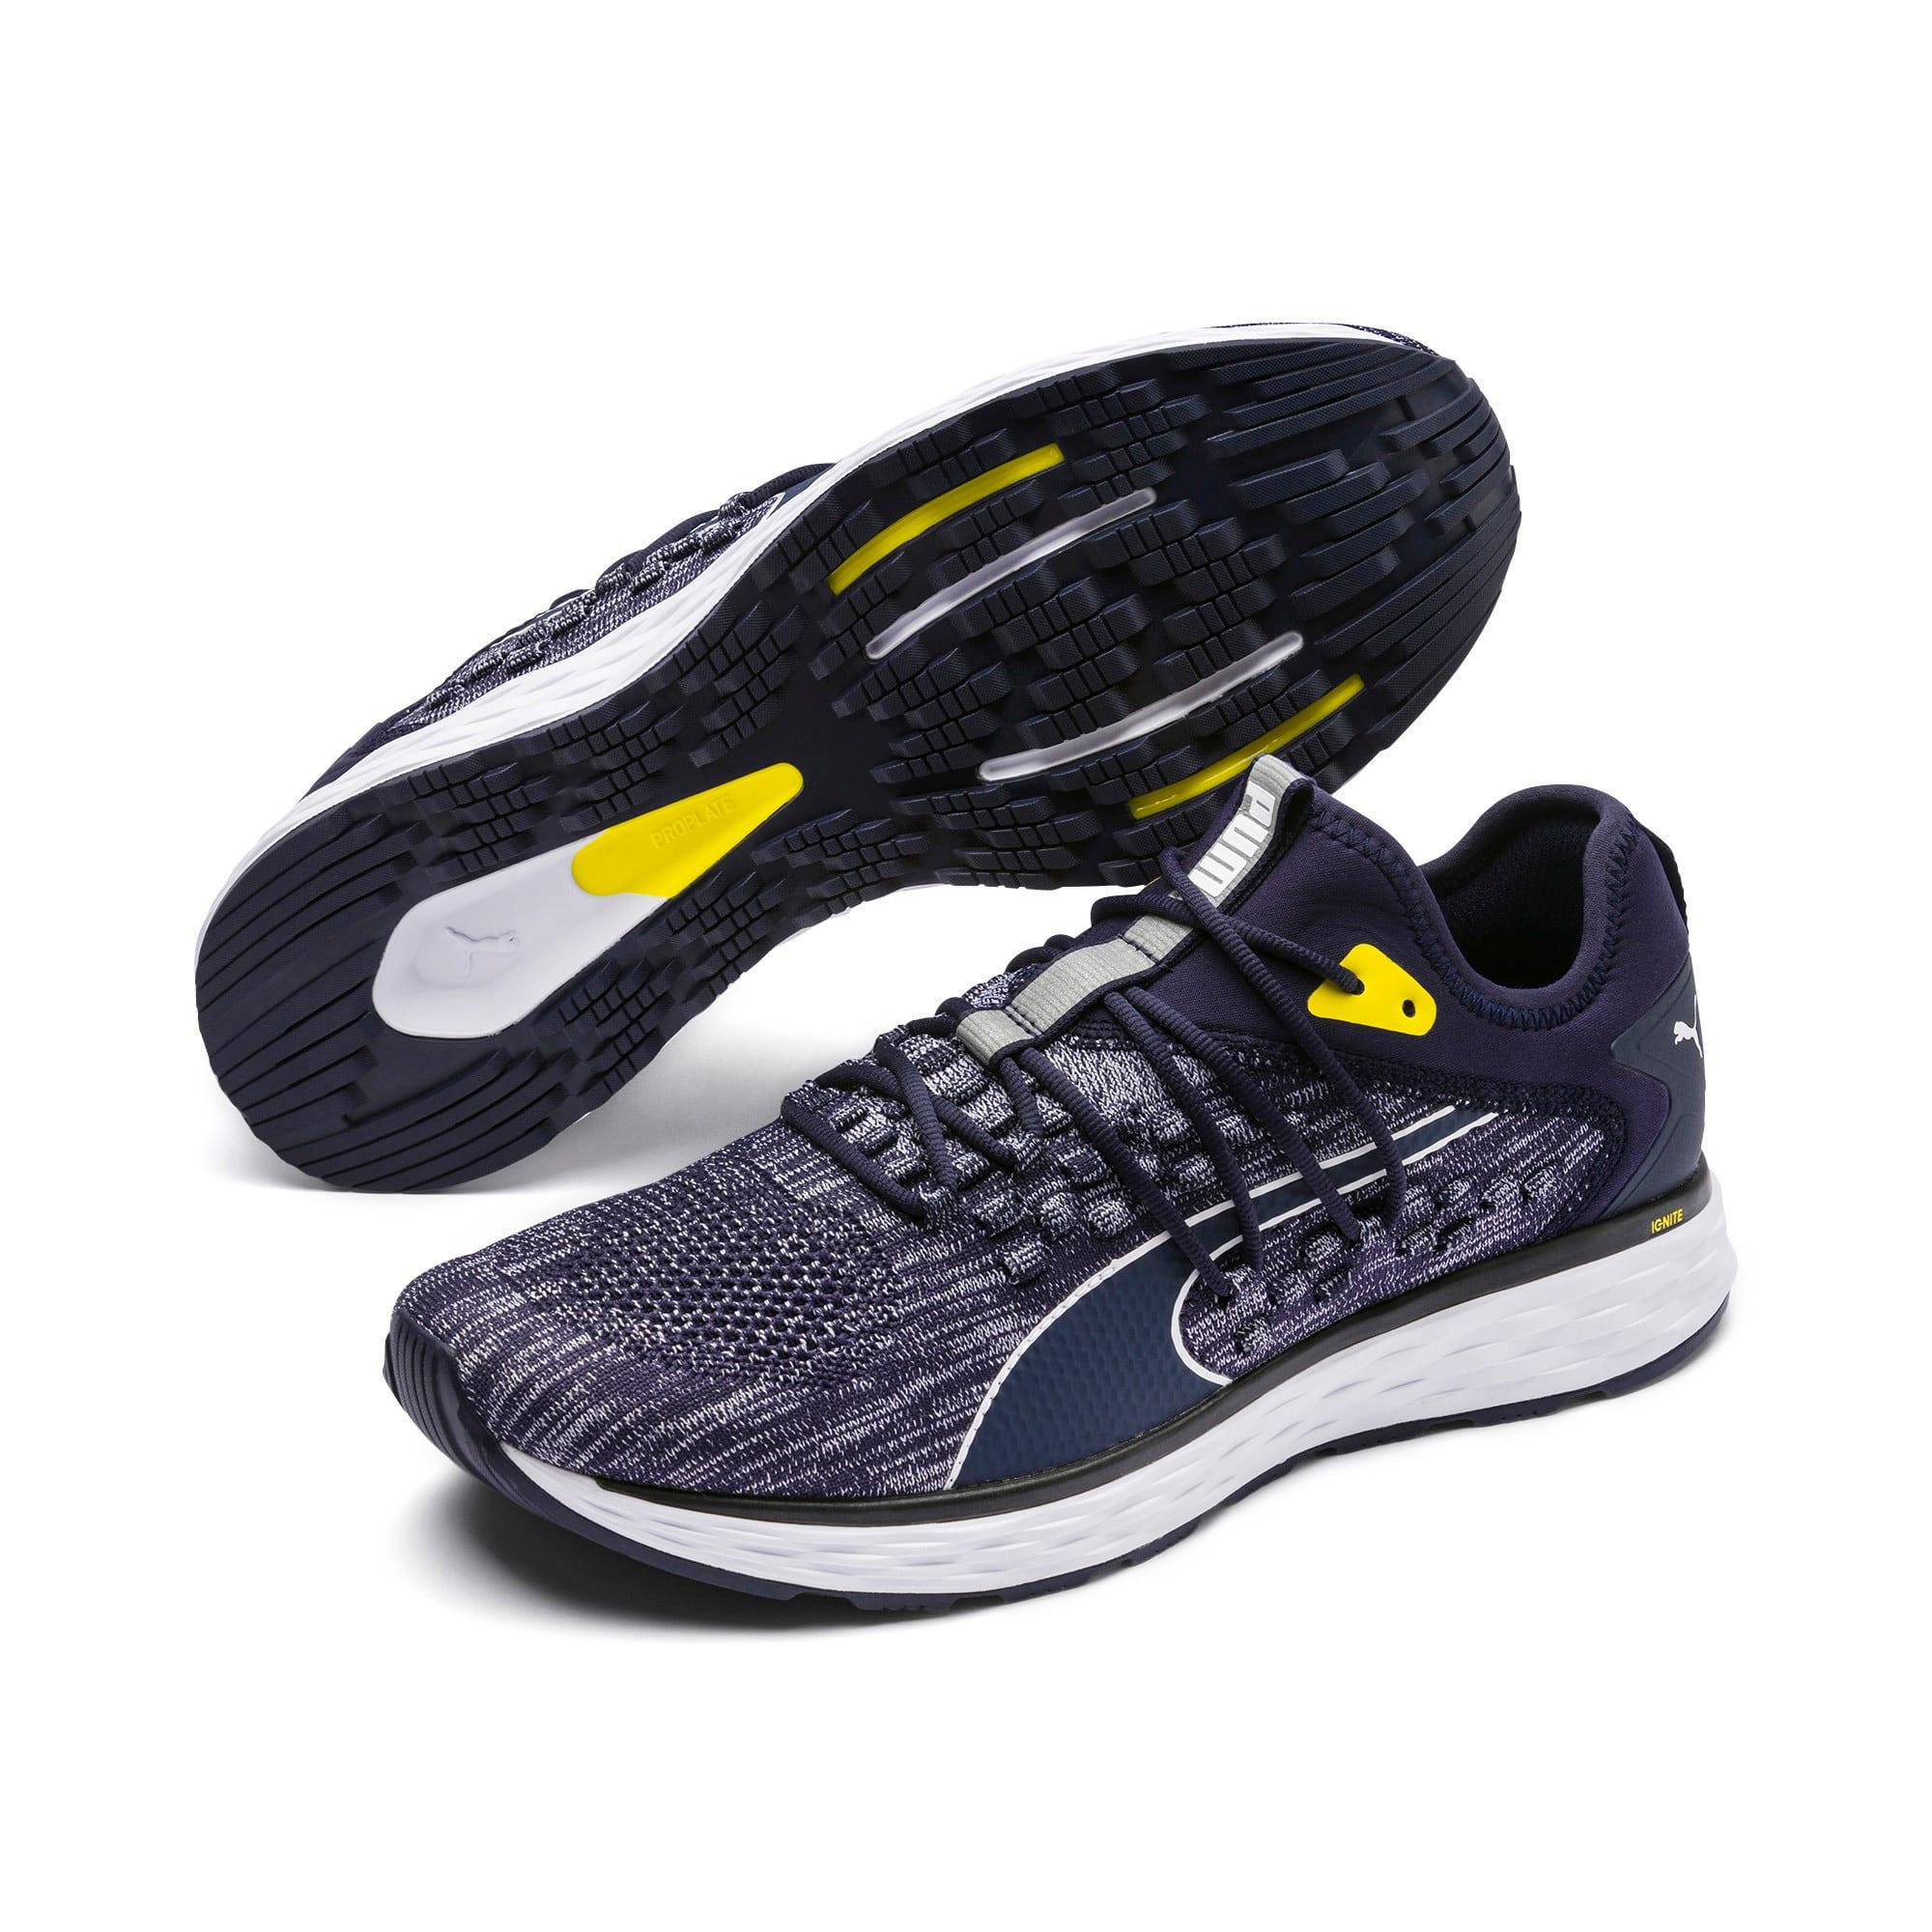 Thumbnail 3 of SPEED FUSEFIT Men's Running Shoes, Peacoat-White-Blazing Yellow, medium-IND